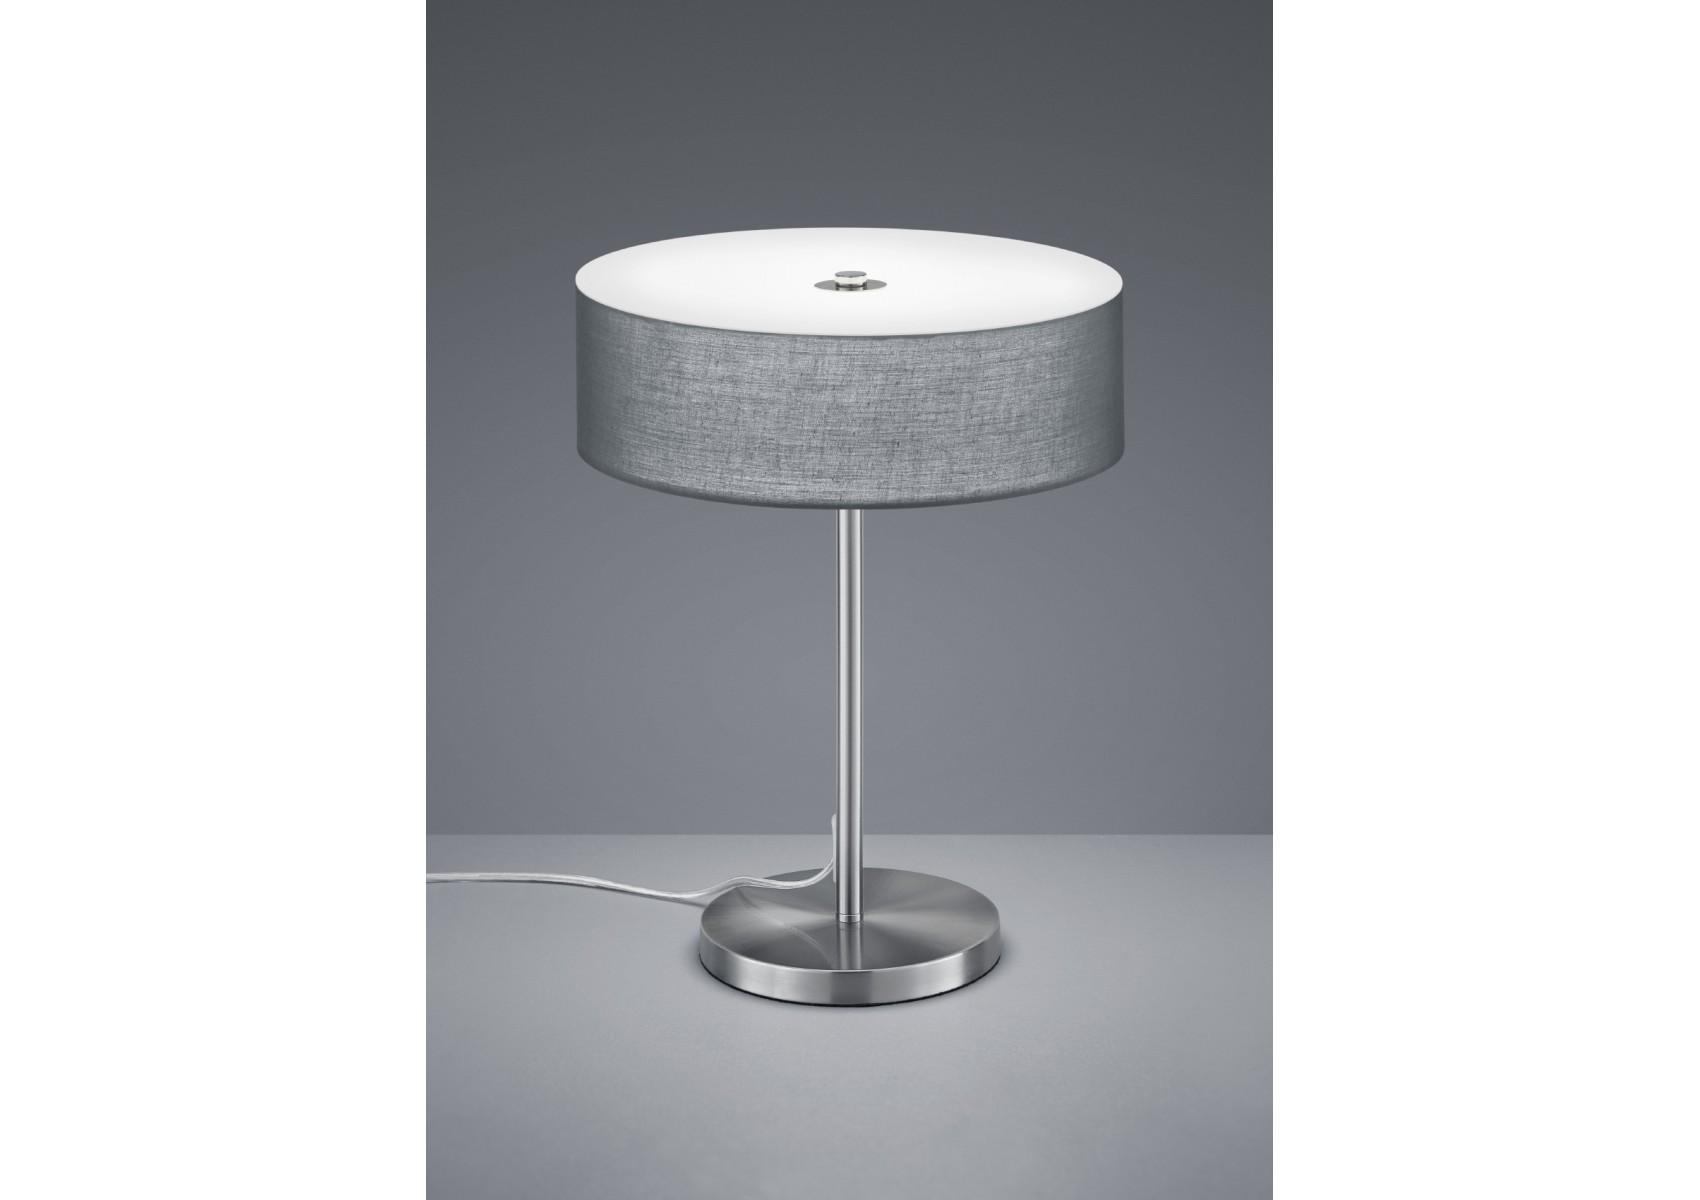 lampe poser design led de la collection lugano de chez trio. Black Bedroom Furniture Sets. Home Design Ideas